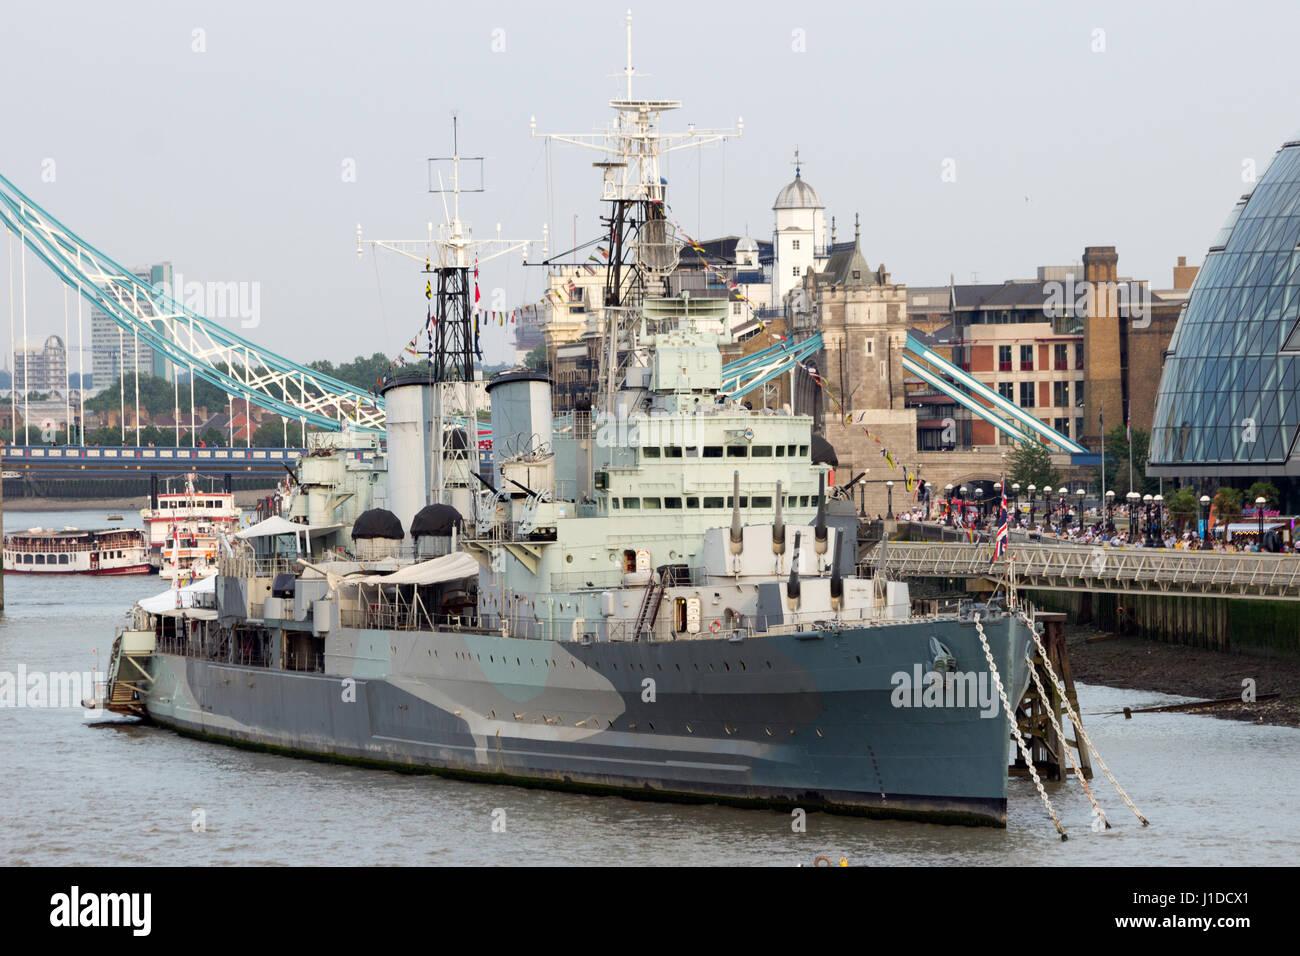 HMS Belfast, former Royal Navy cruiser, in London. - Stock Image